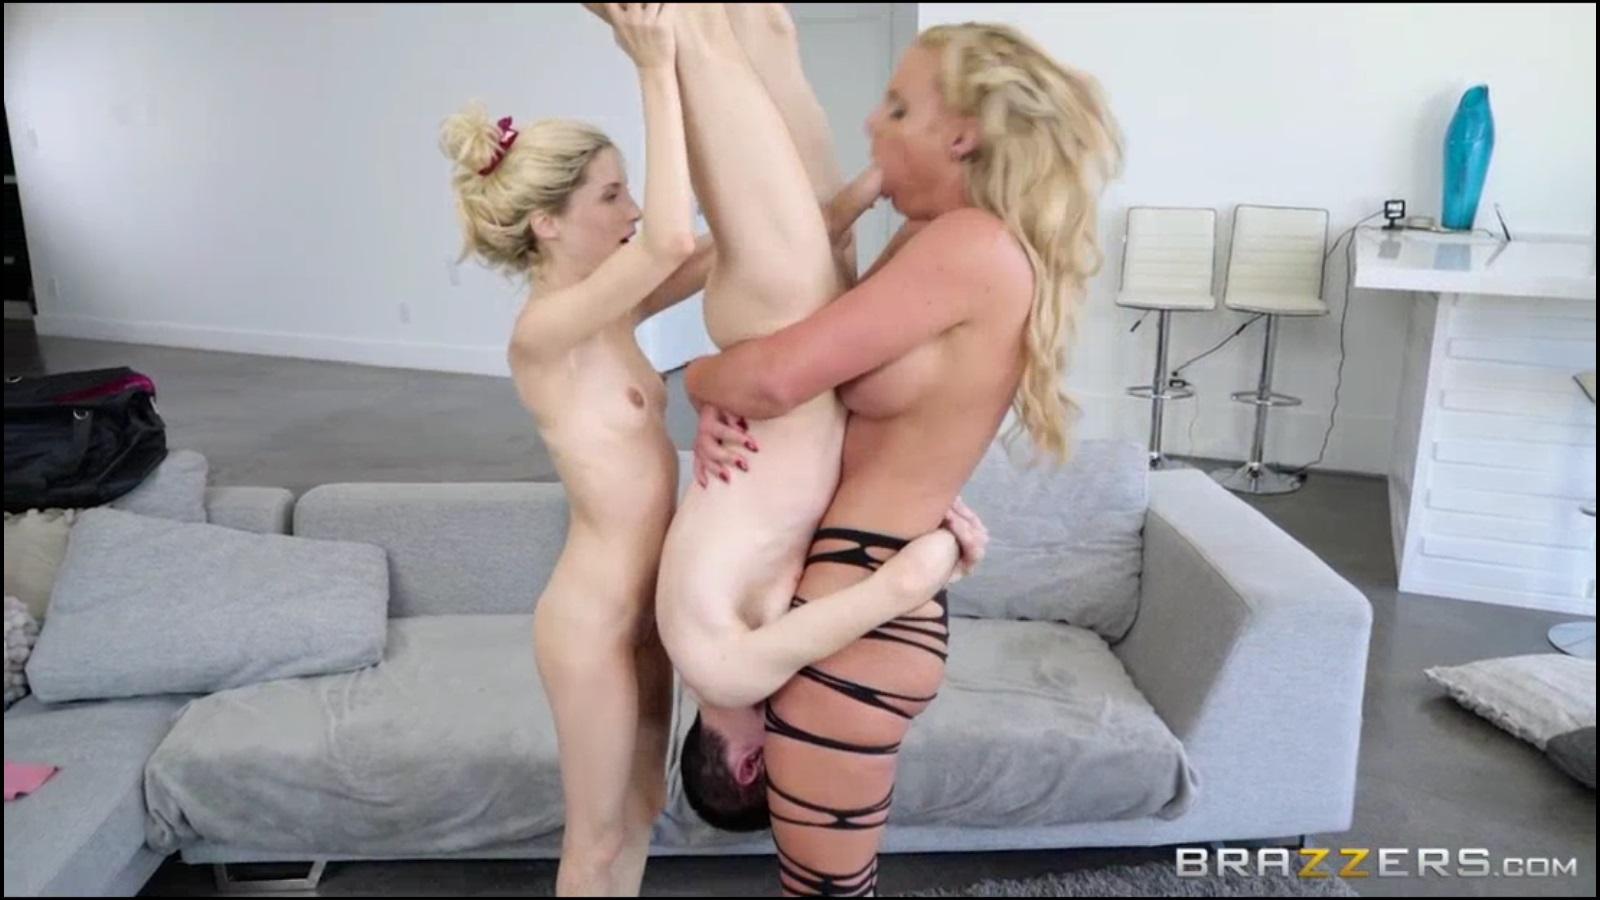 vild sex tv